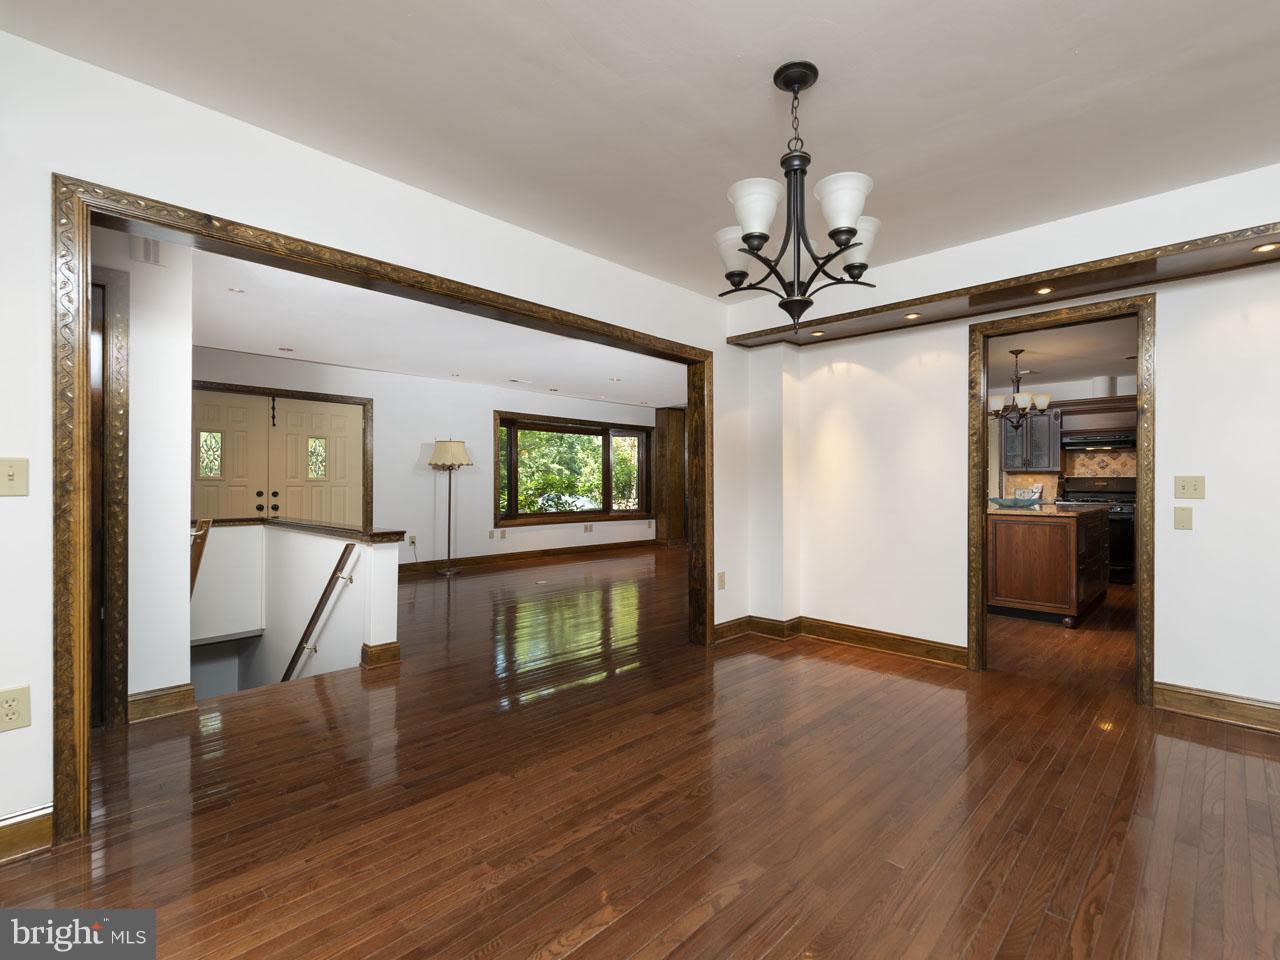 1002303700-300502418977-2021-07-22-03-27-24  |   | Alexandria Delaware Real Estate For Sale | MLS# 1002303700  - Best of Northern Virginia